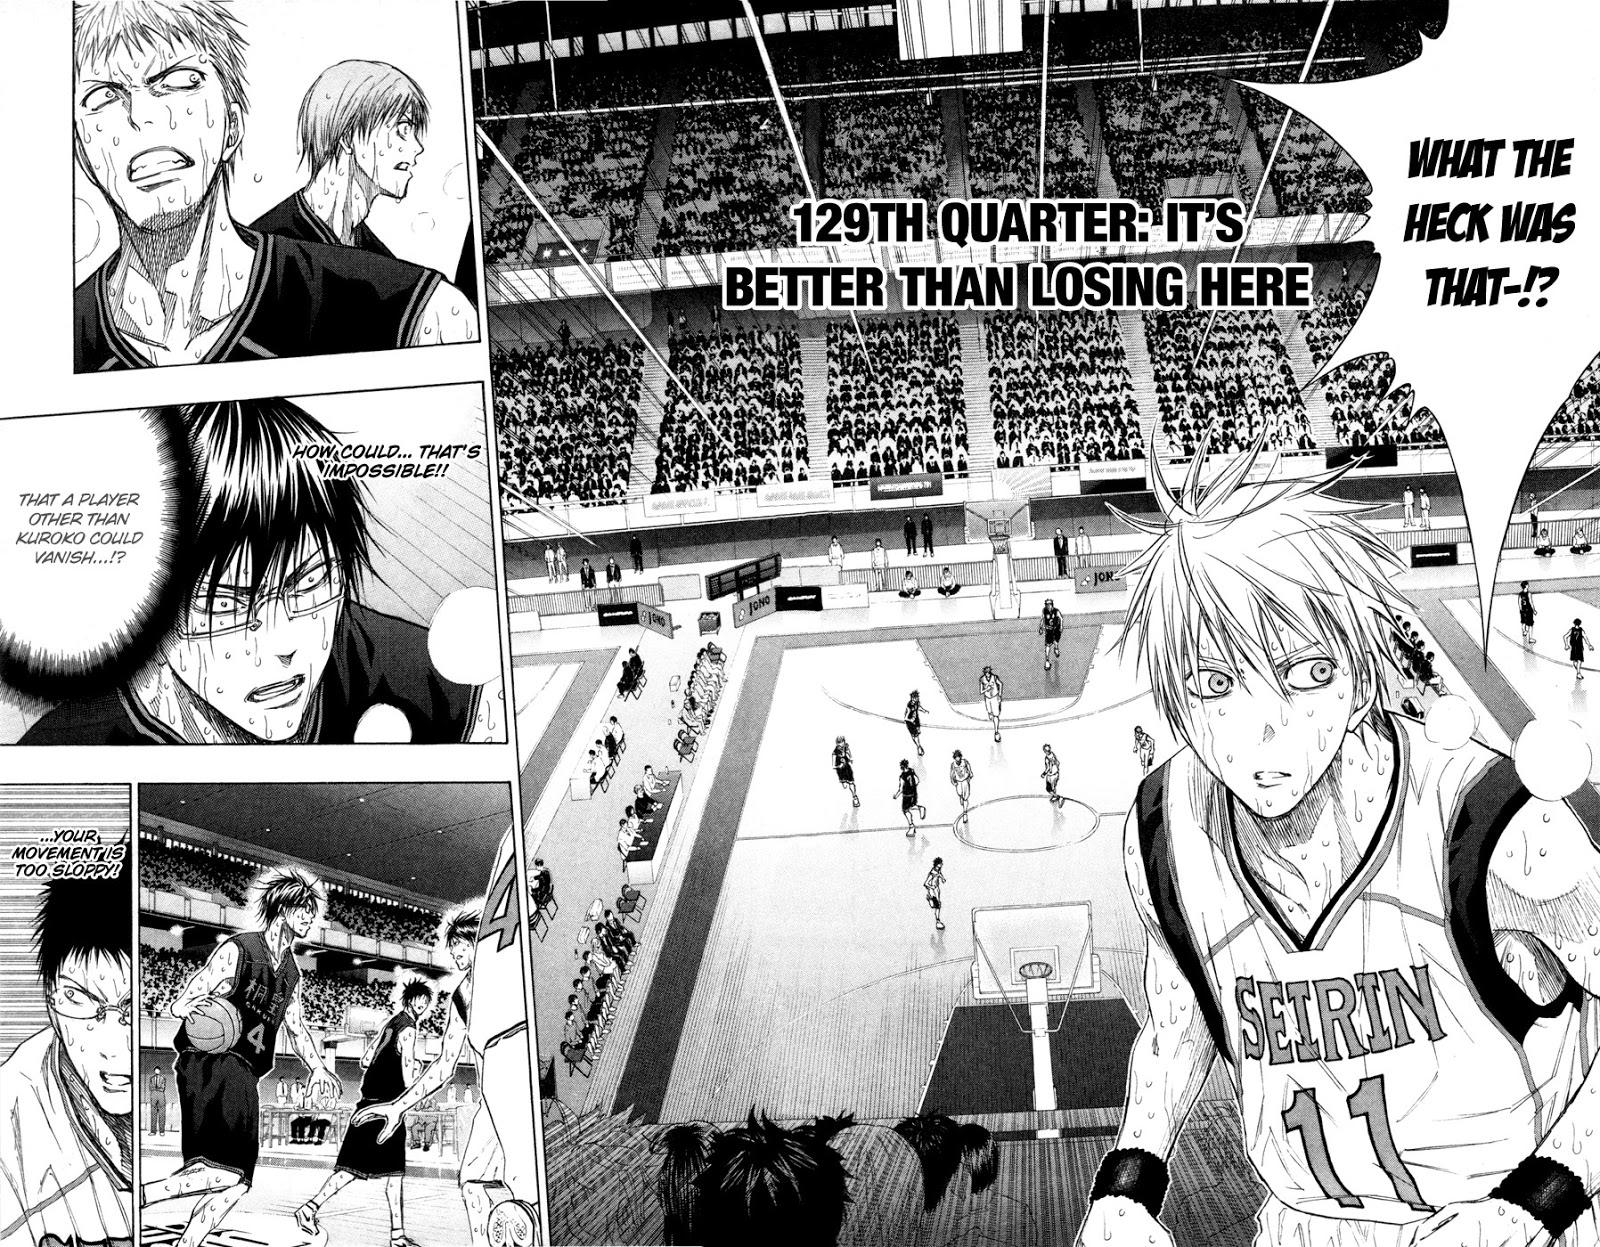 Kuroko no Basket Manga Chapter 129 - Image 02-02